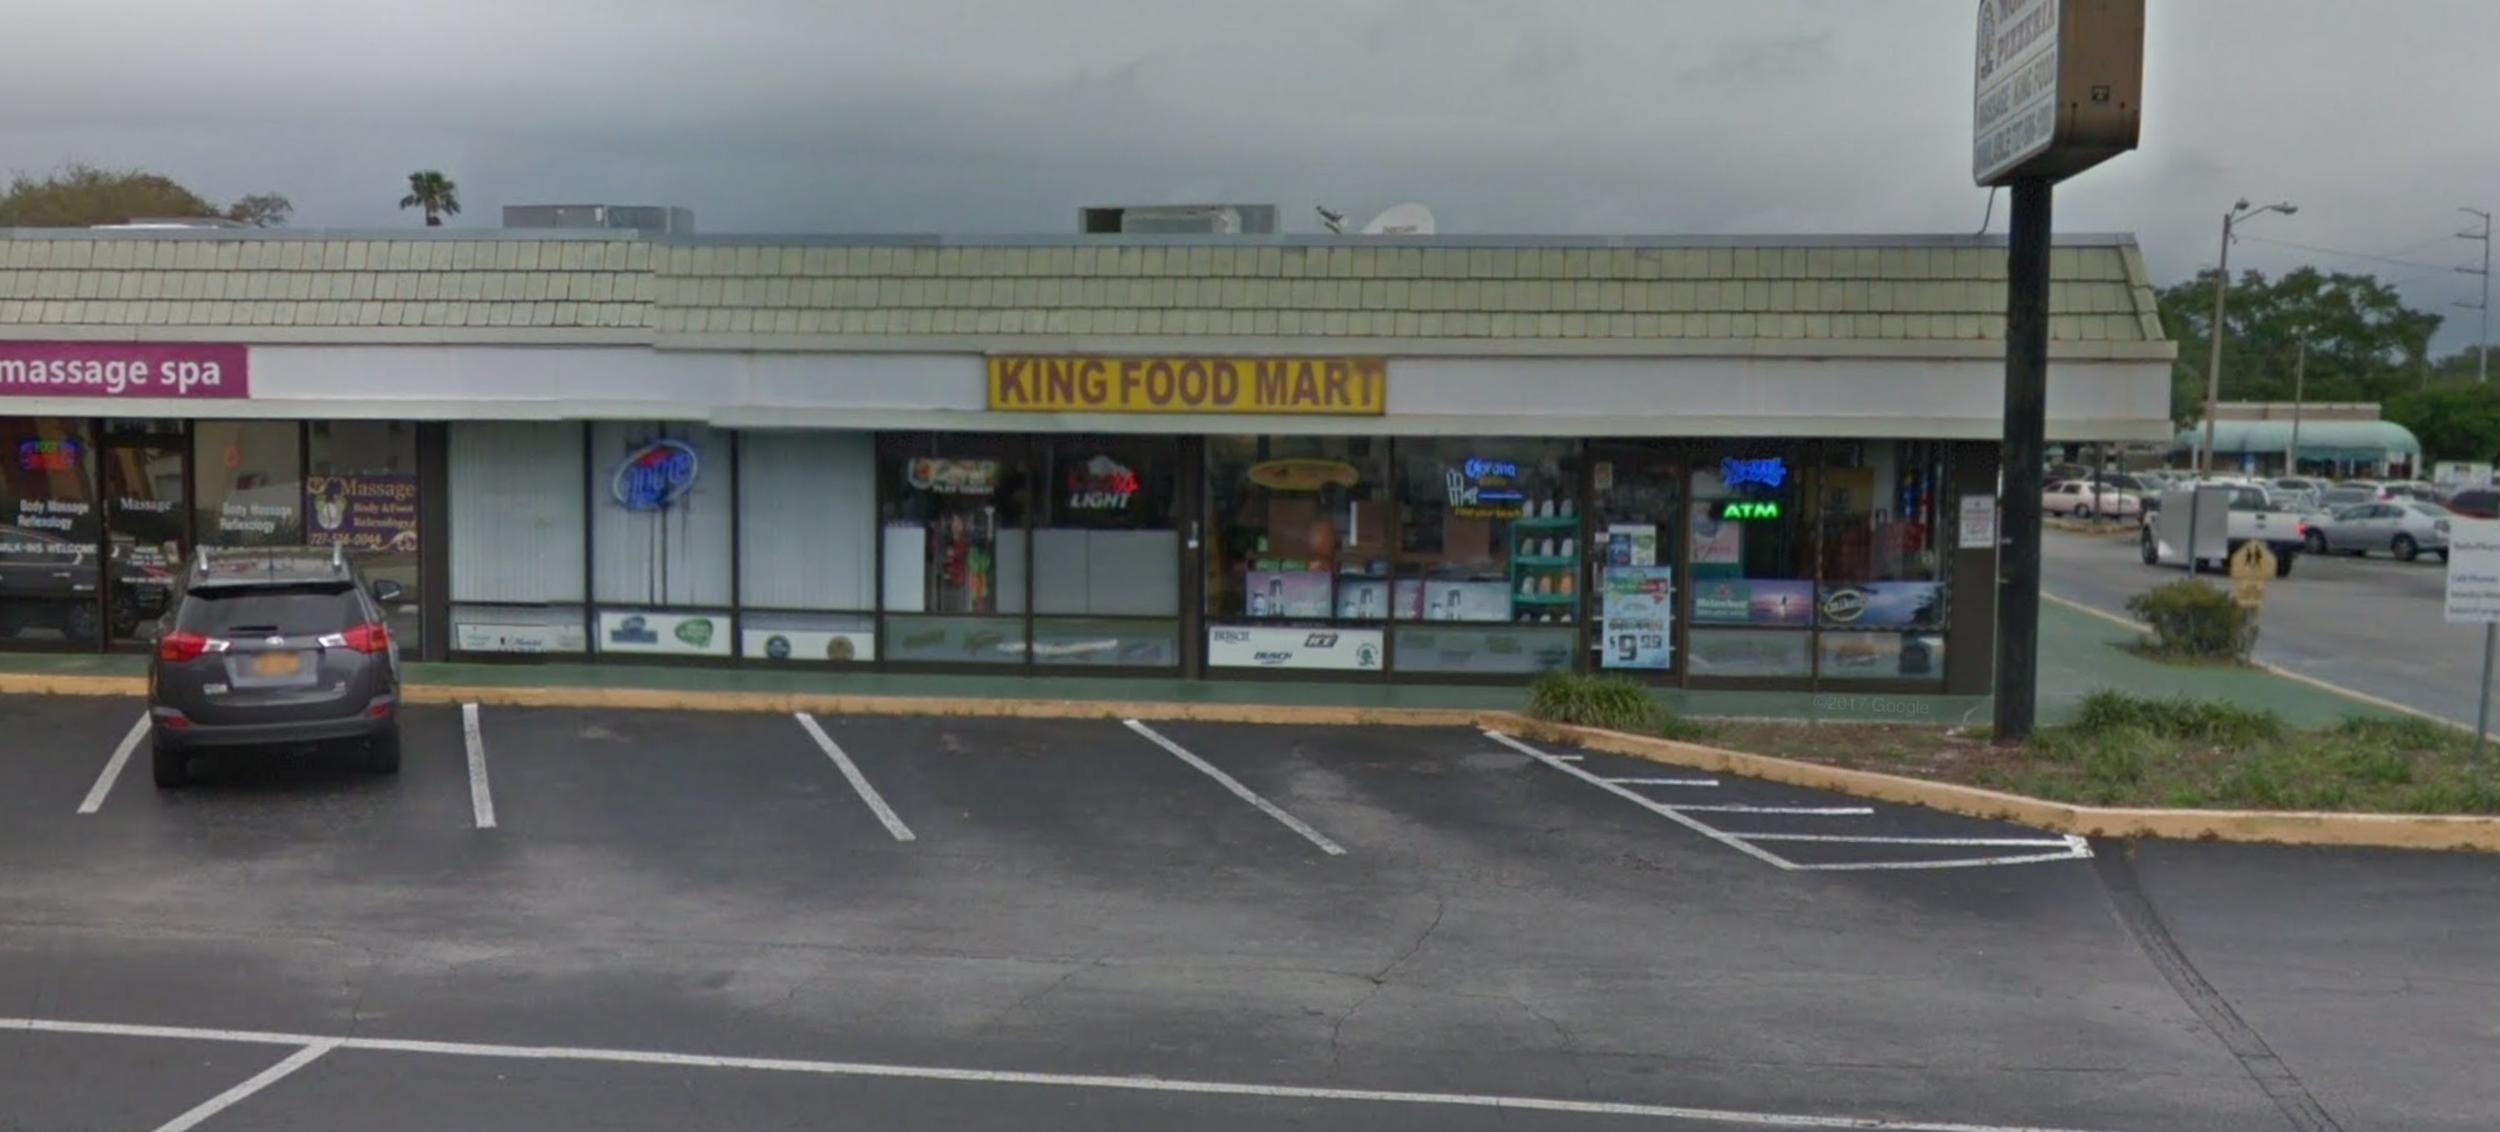 King Food Mart exterior.png